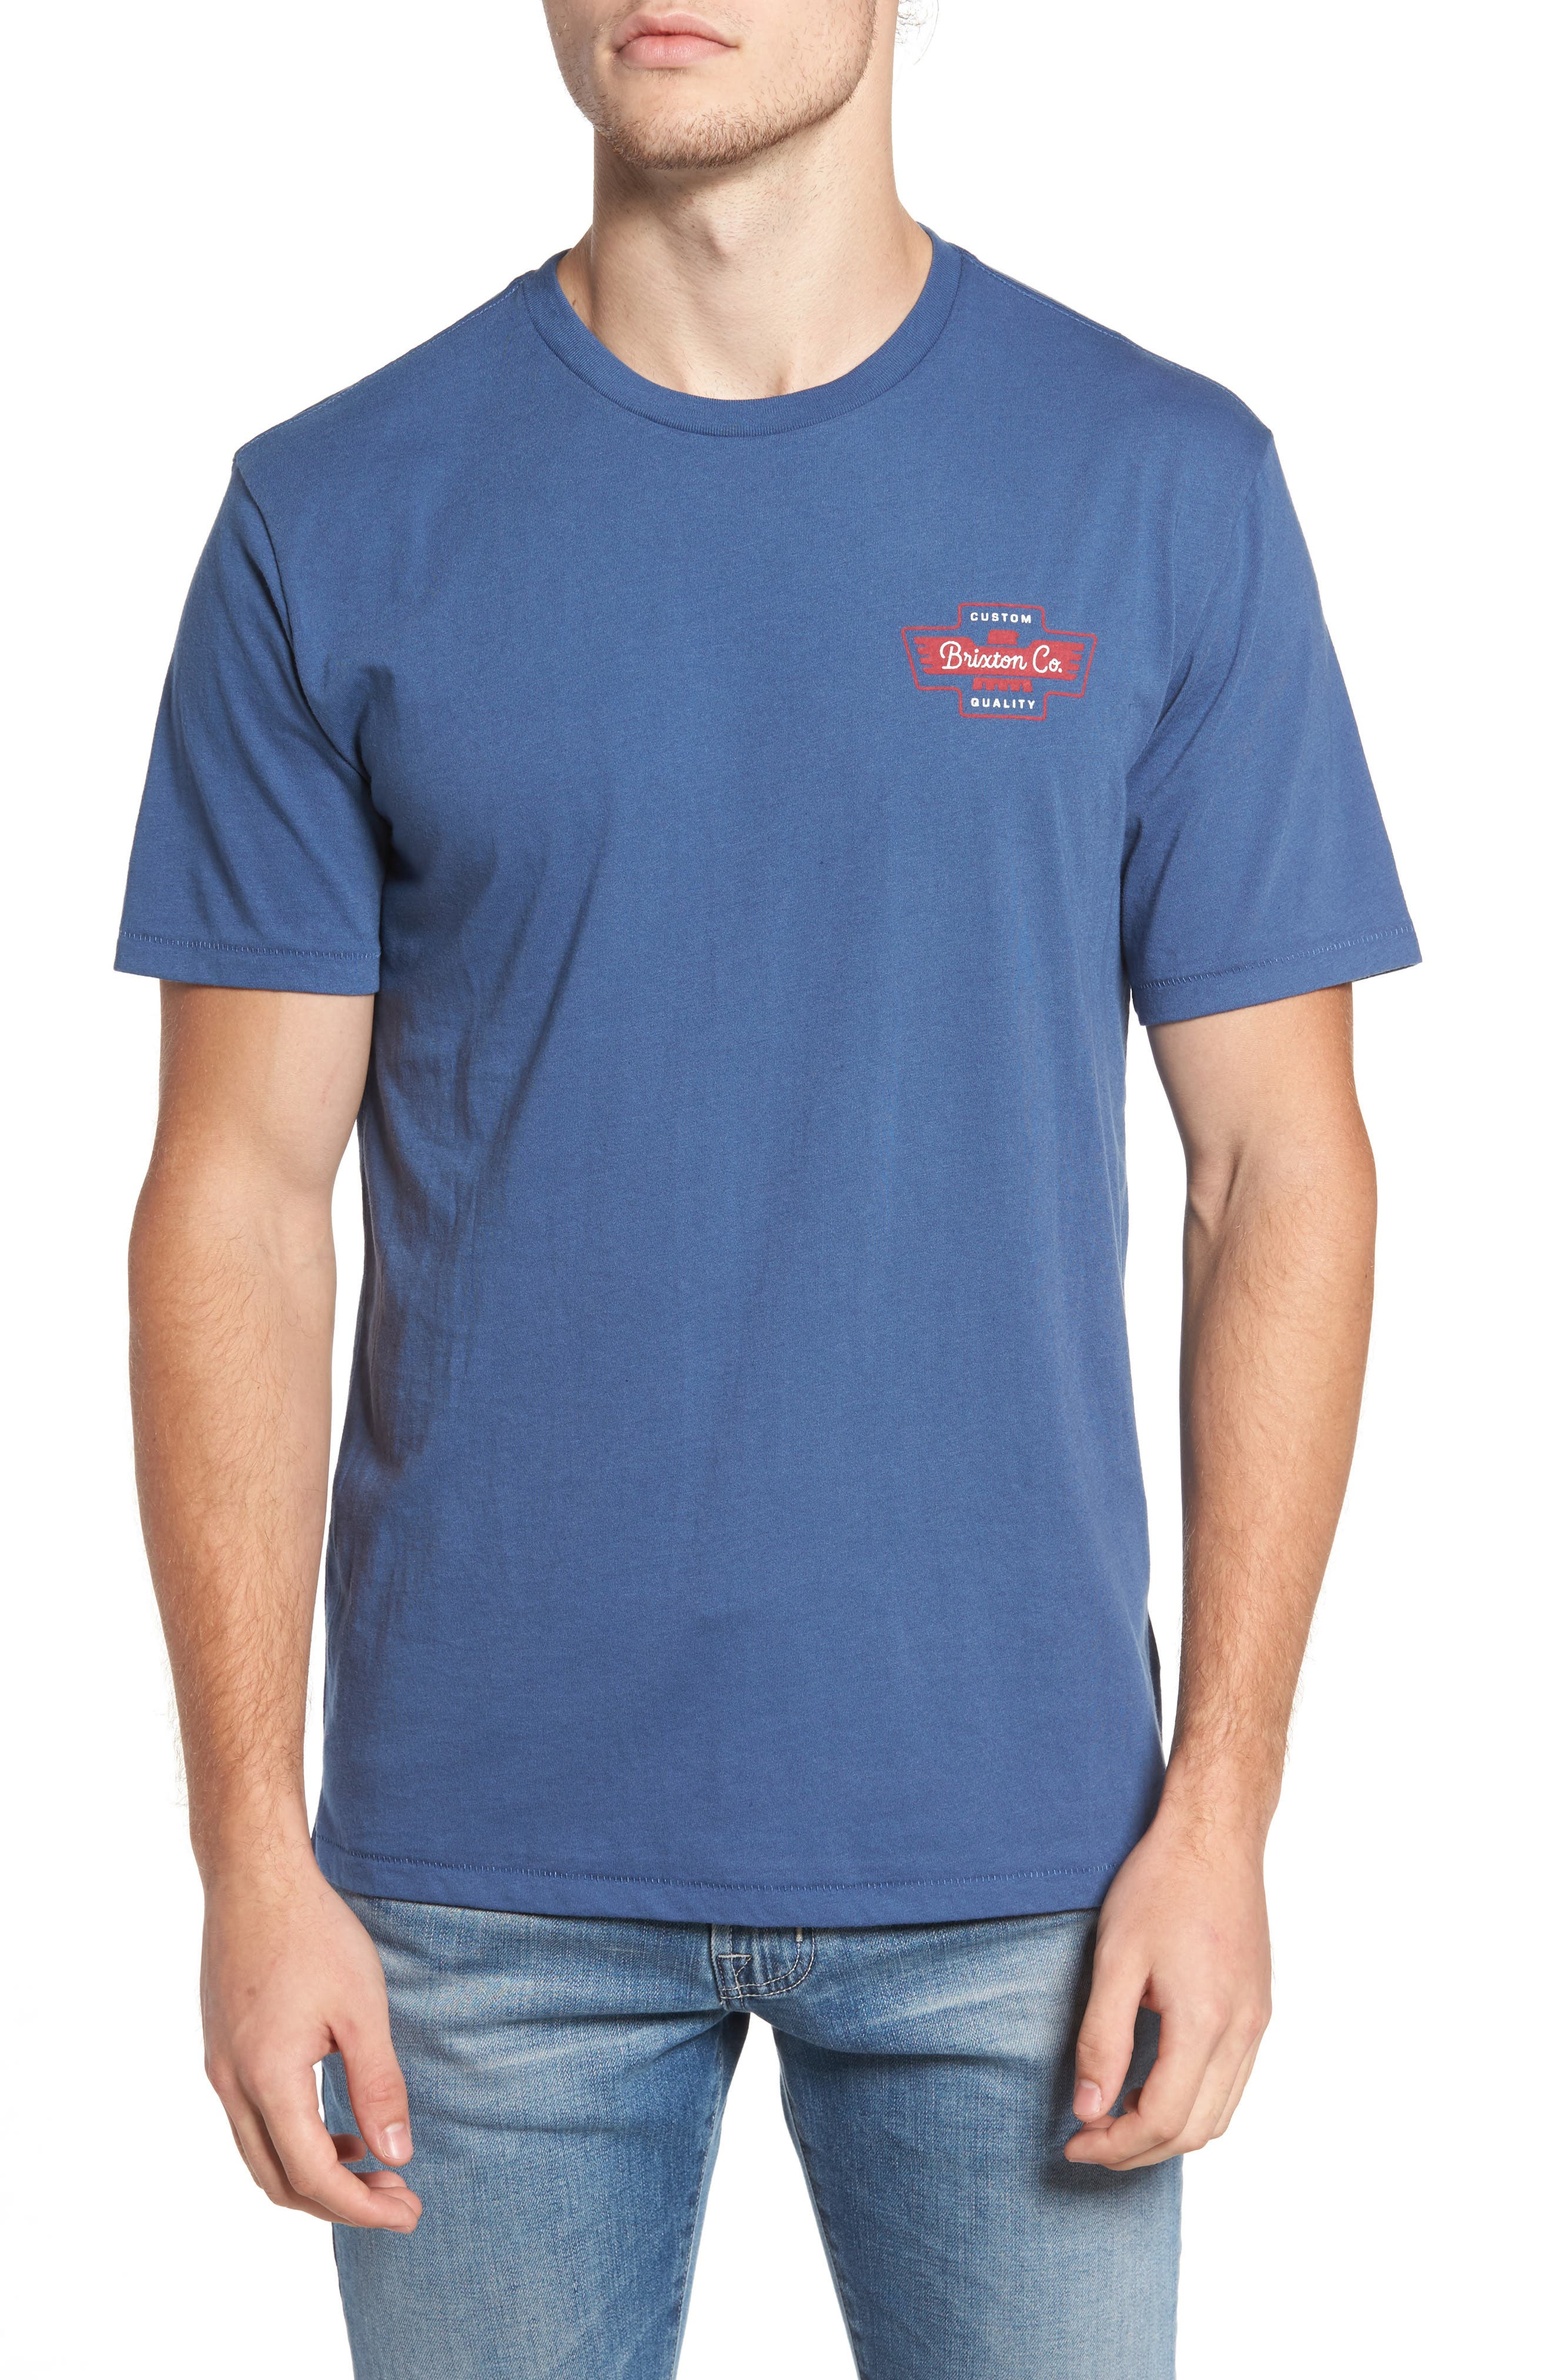 Main Image - Brixton Federal Premium Graphic T-Shirt